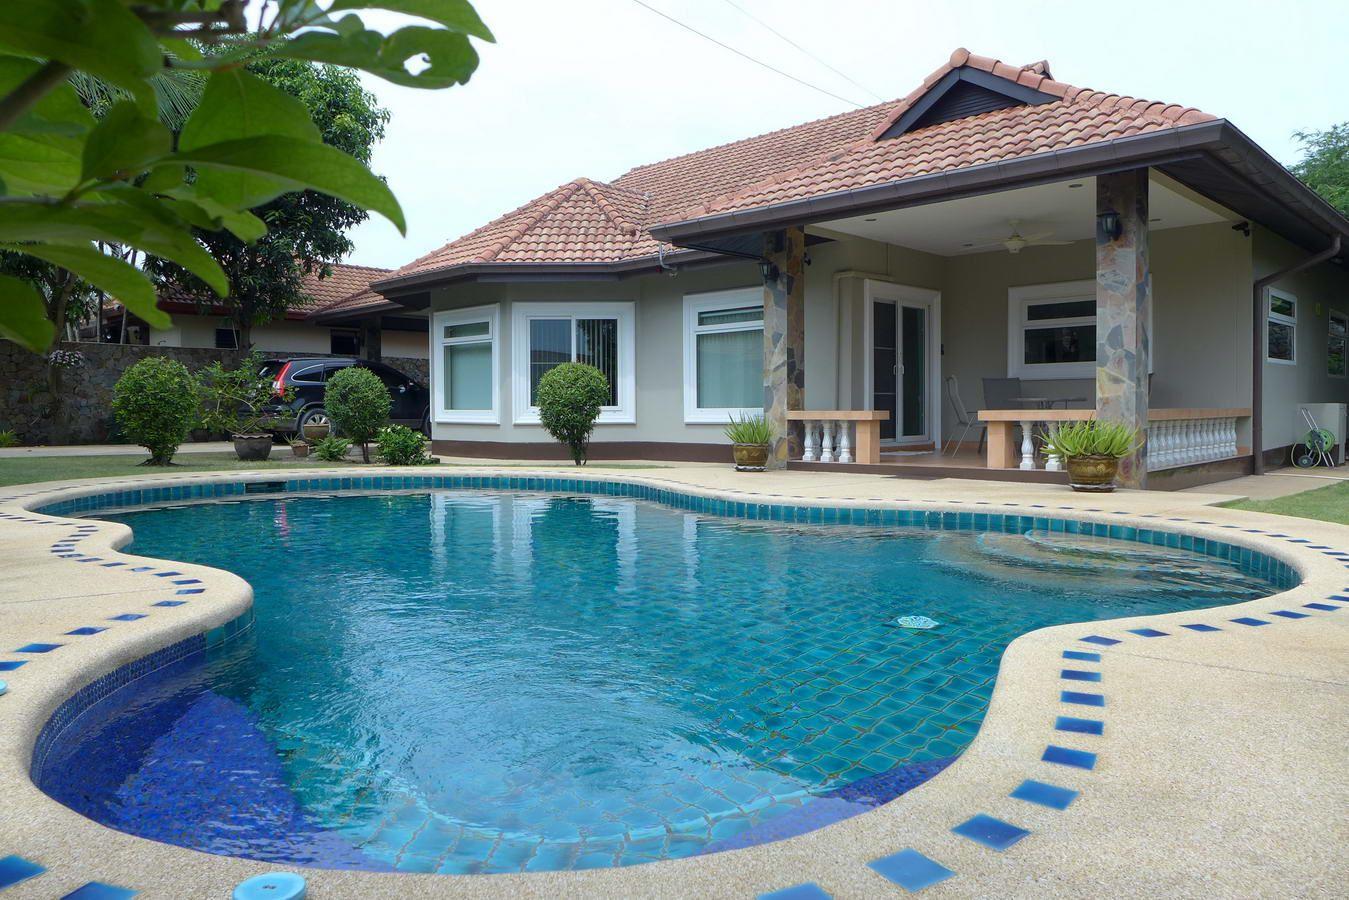 Nord Pattaya Pool Villa zu vermieten